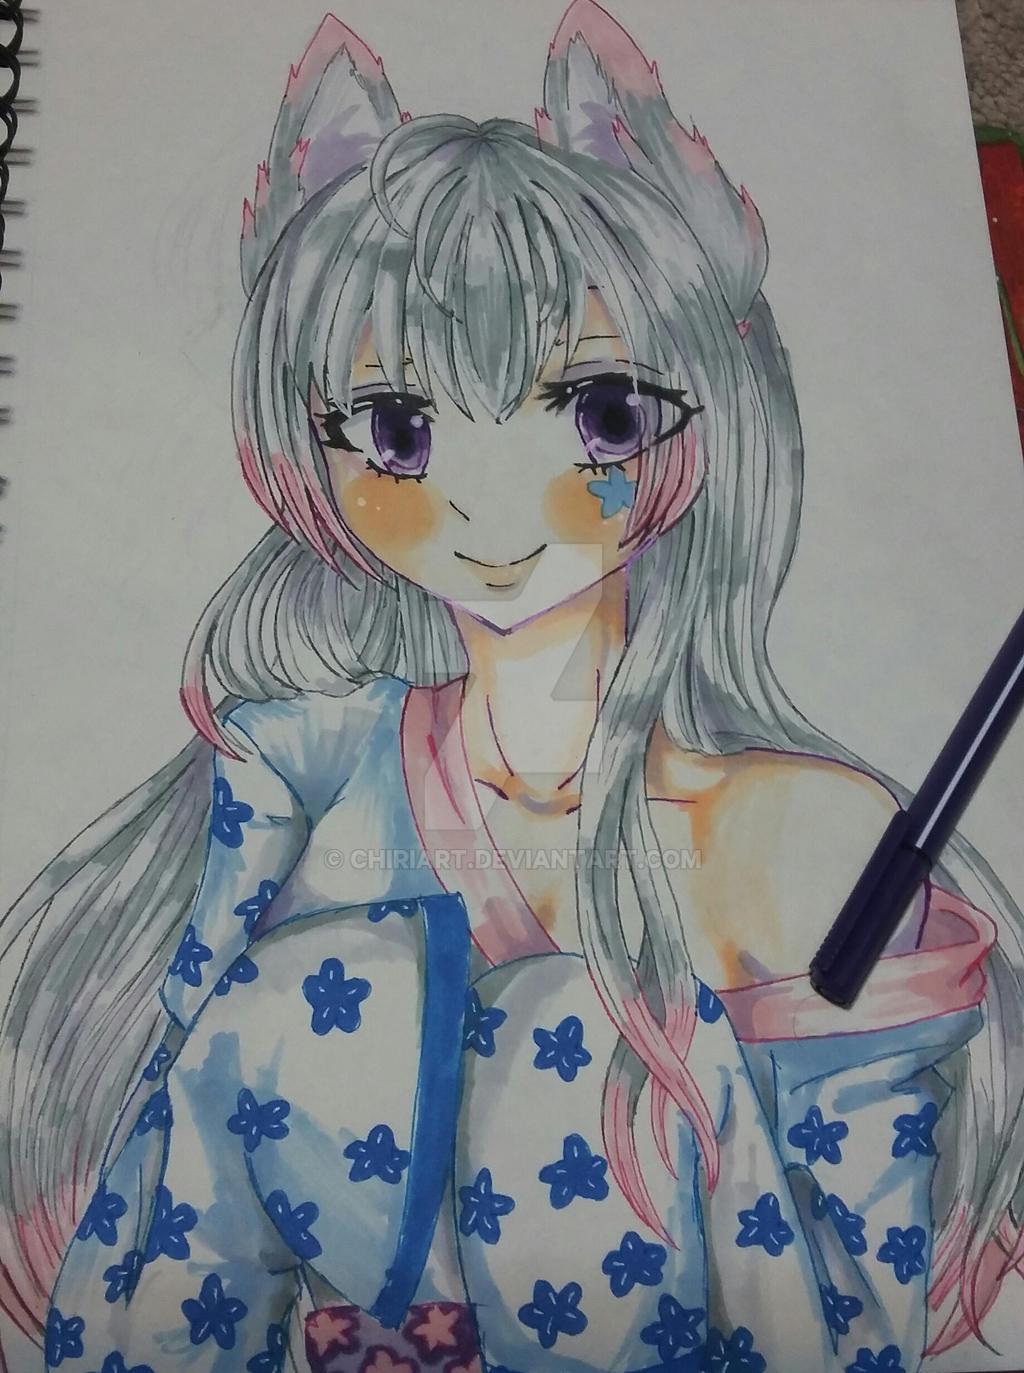 Kaerys Kitsune (human form) by chiriart on DeviantArt